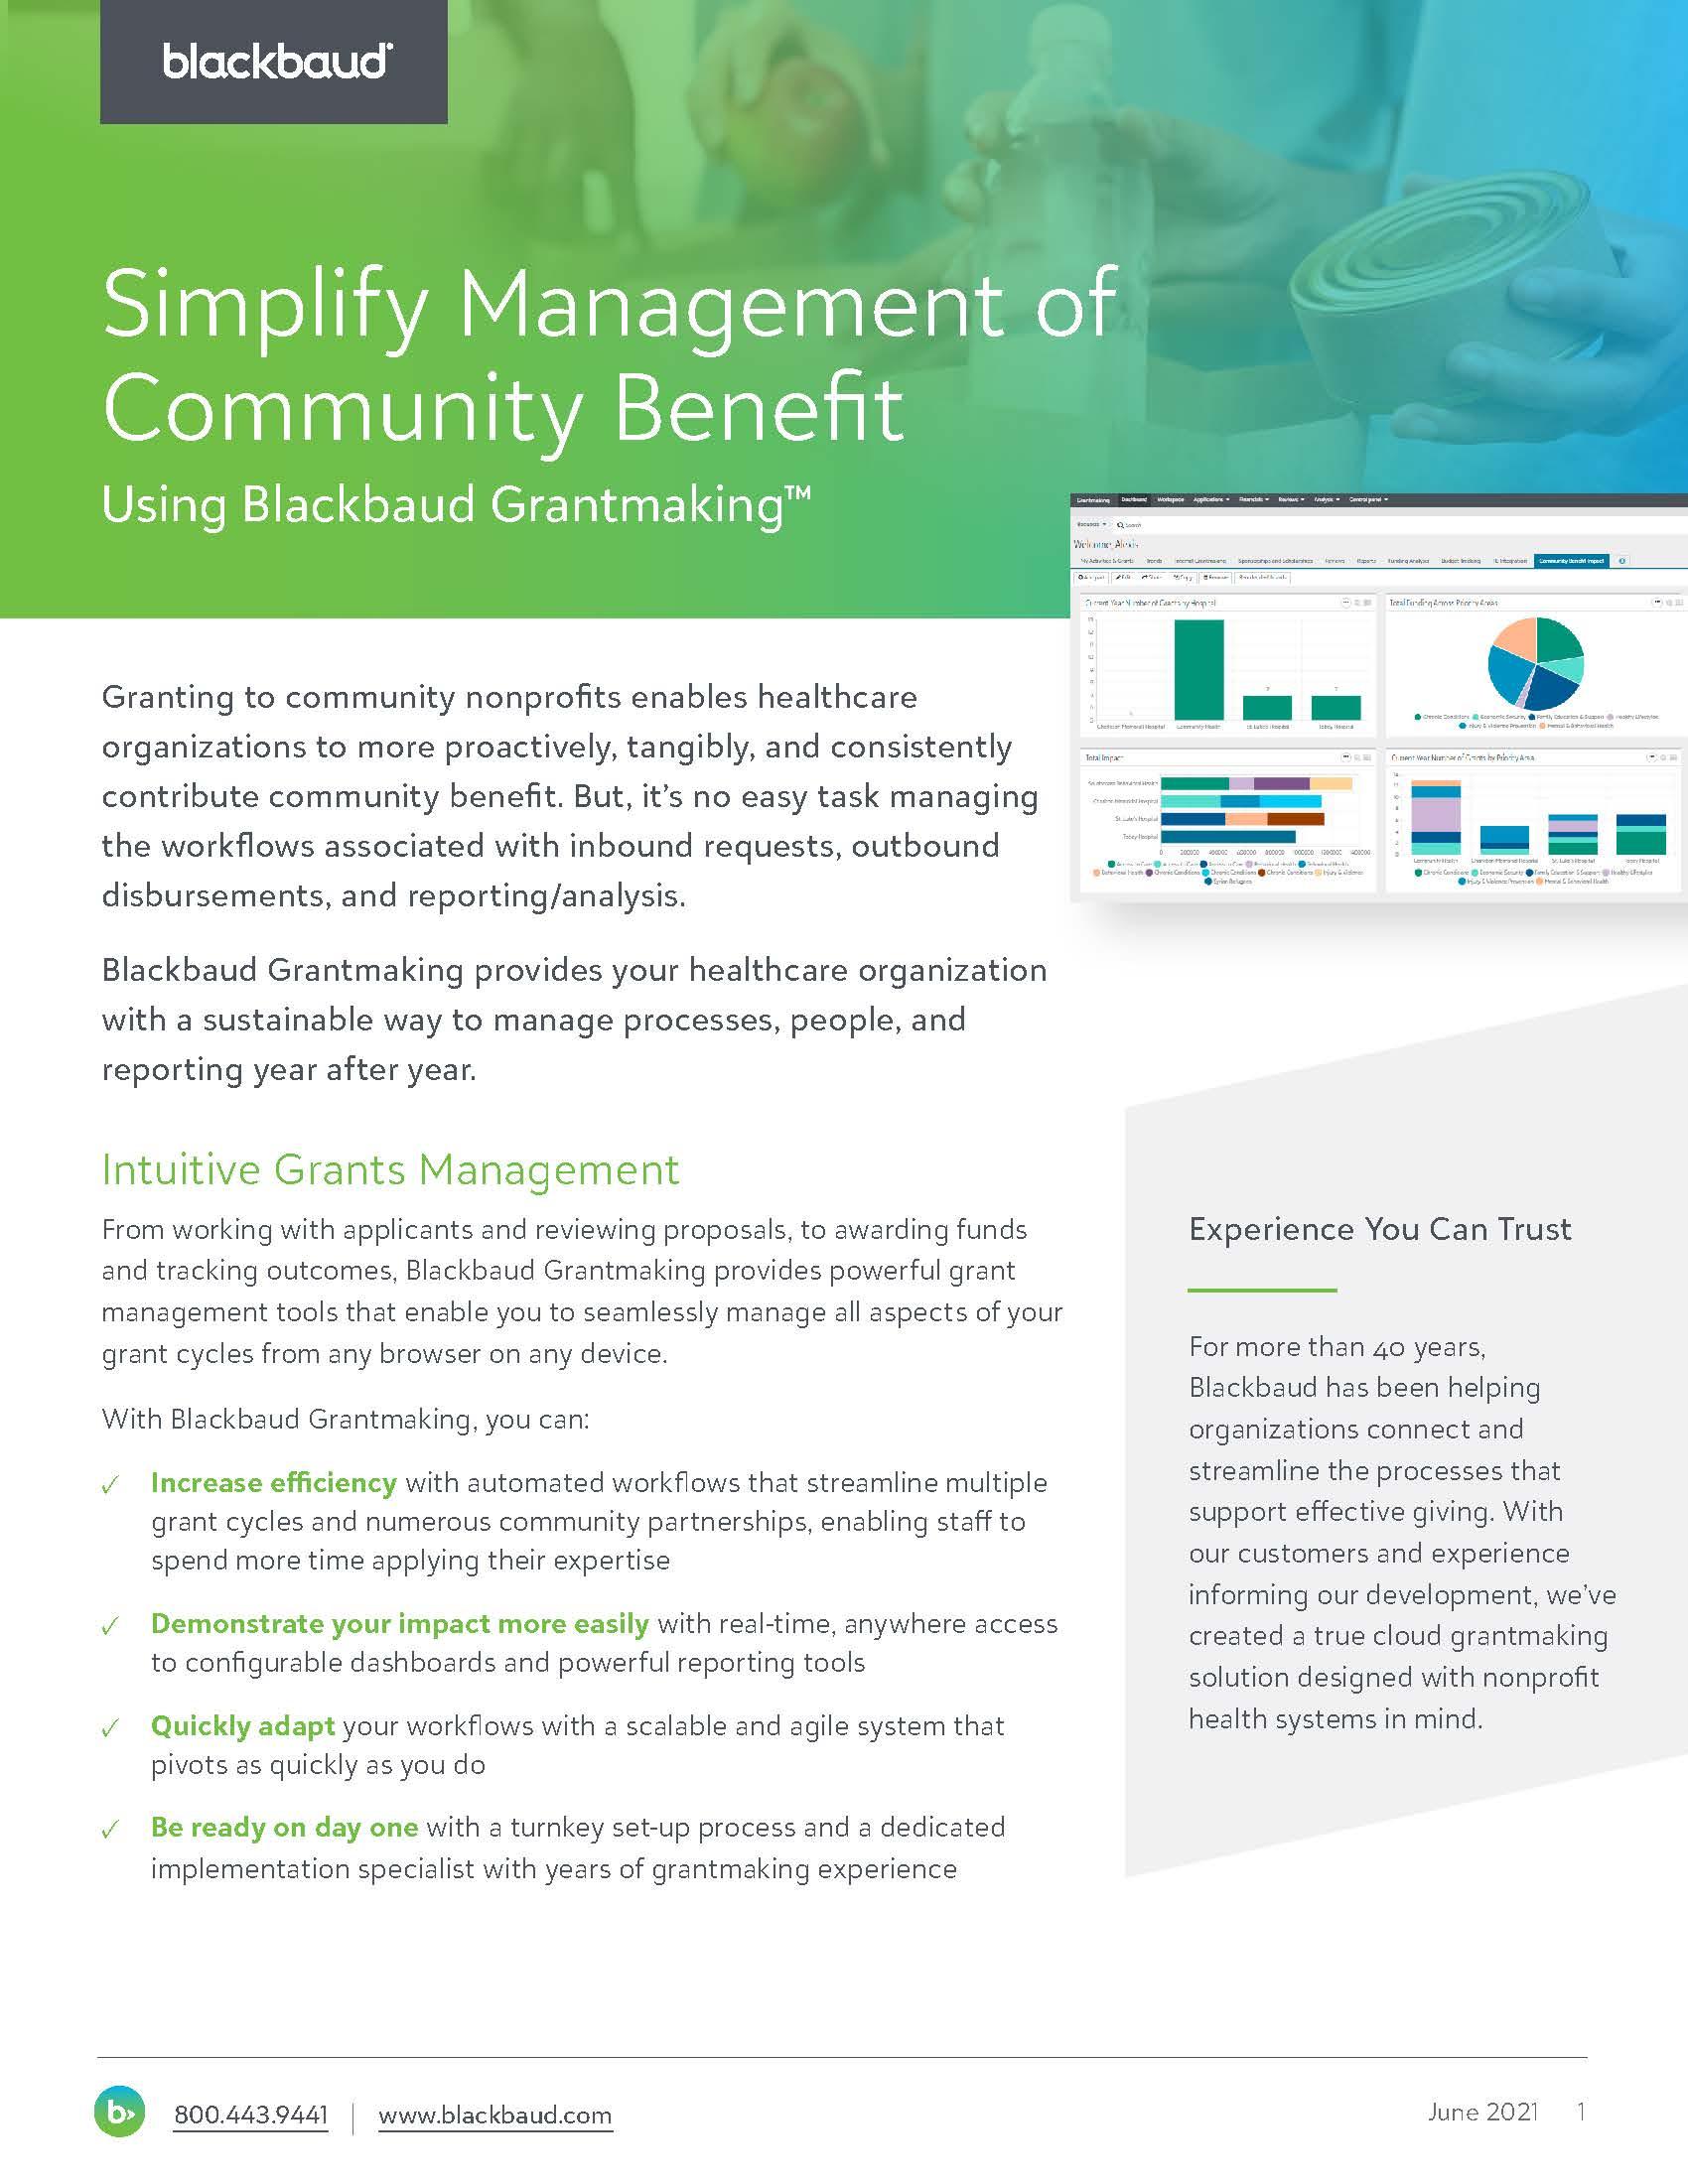 Simplify Management of Community Benefit